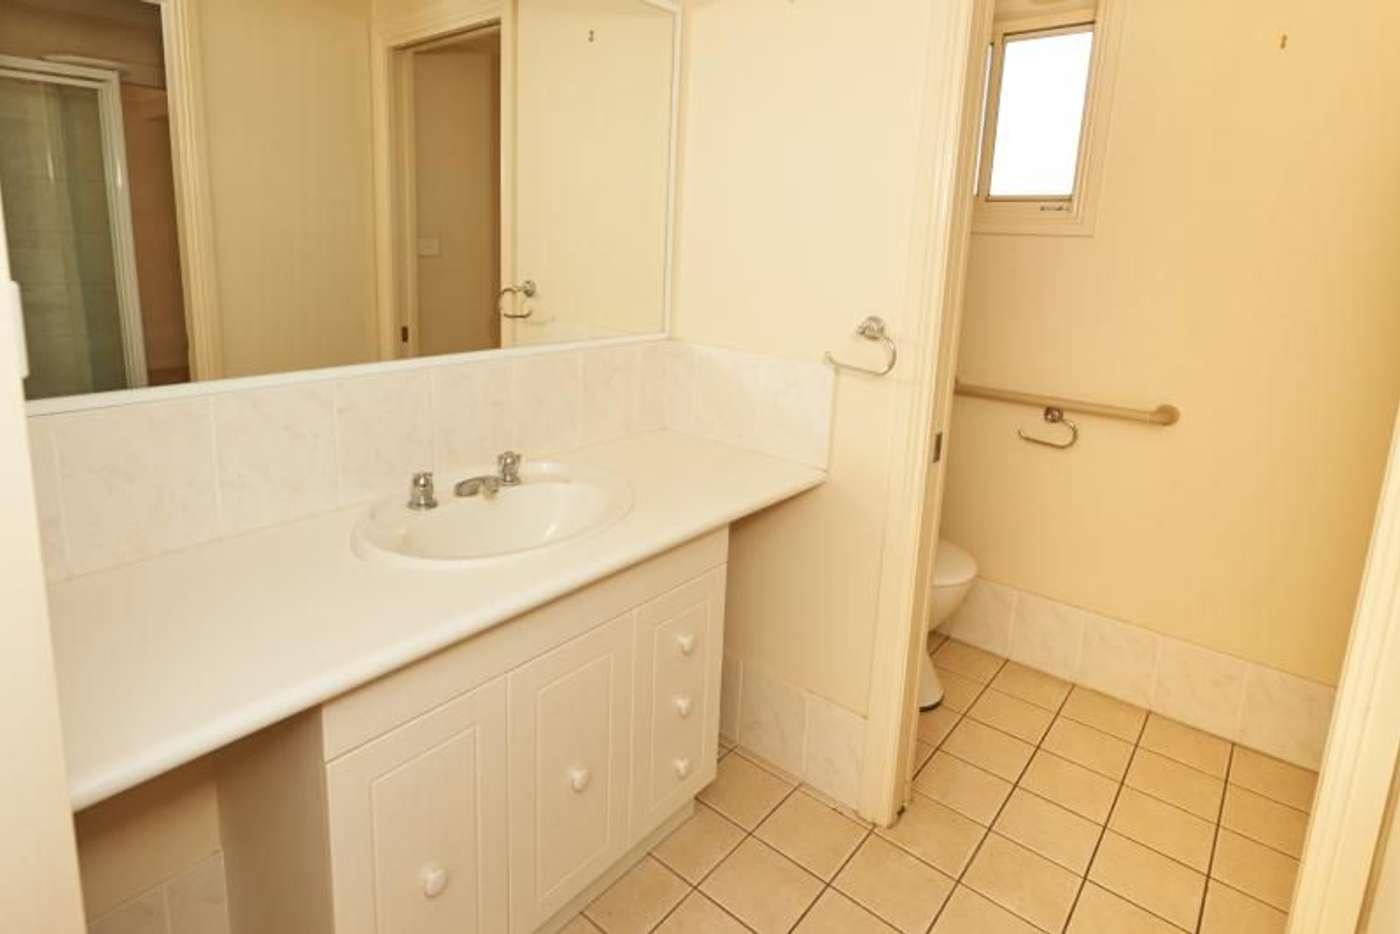 Sixth view of Homely house listing, 75 Pinaroo Drive, Wagga Wagga NSW 2650